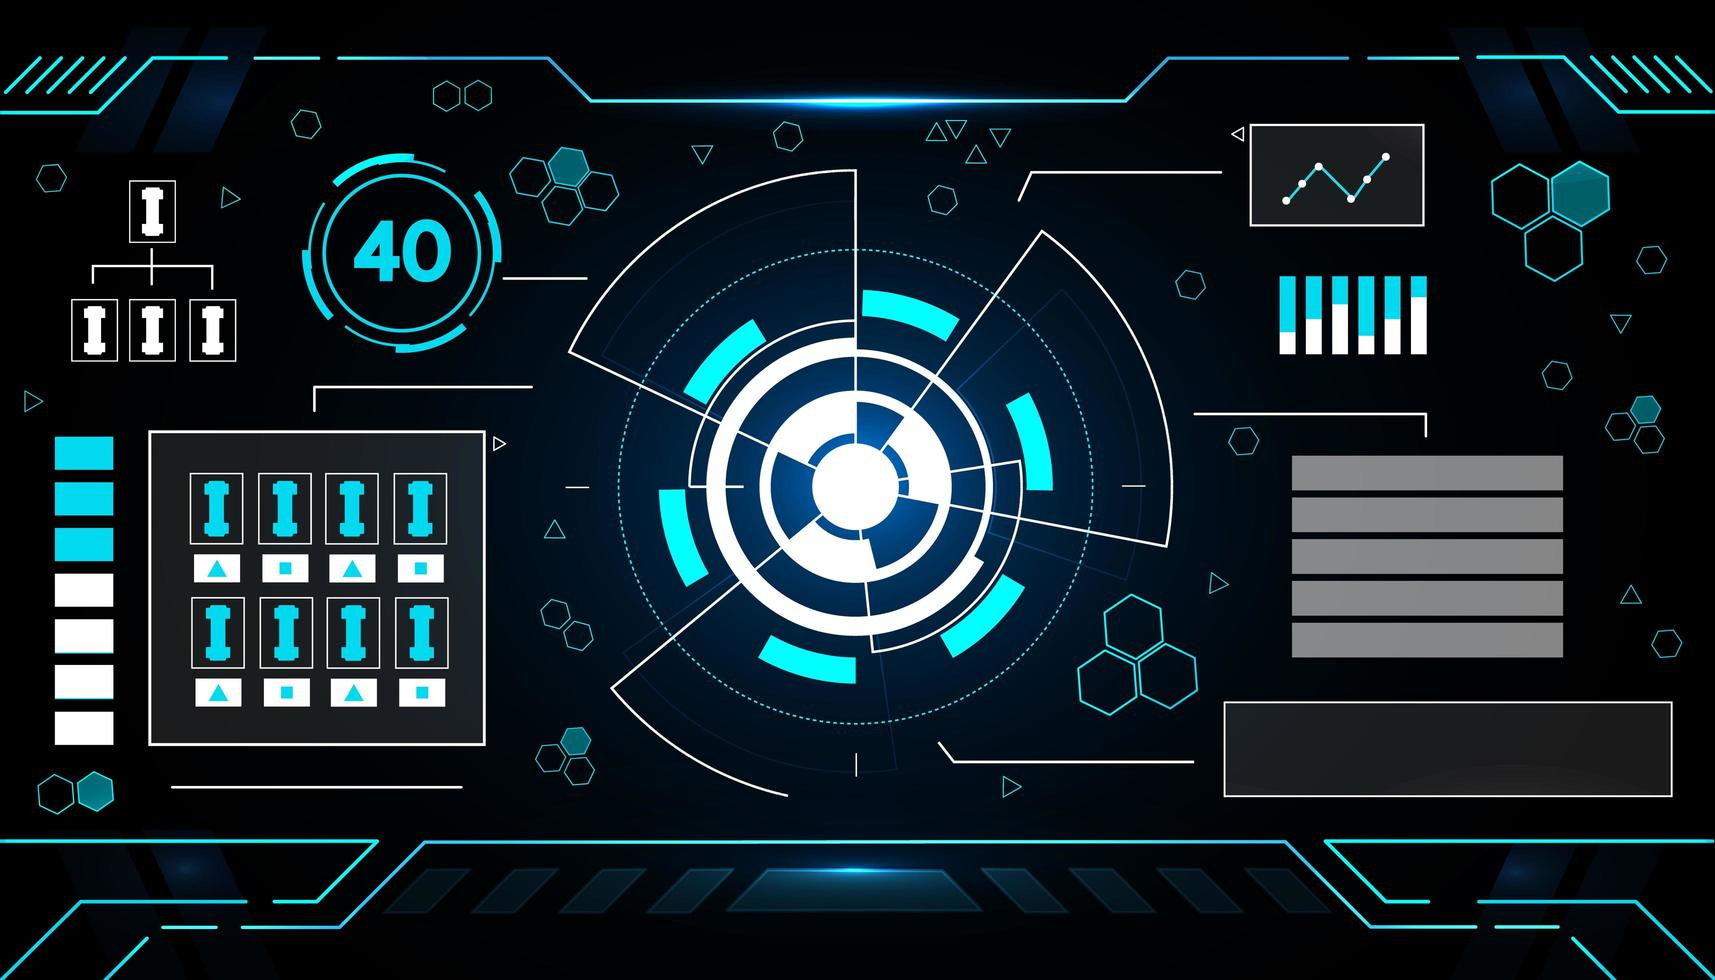 diseño de tecnología de interfaz futurista vector